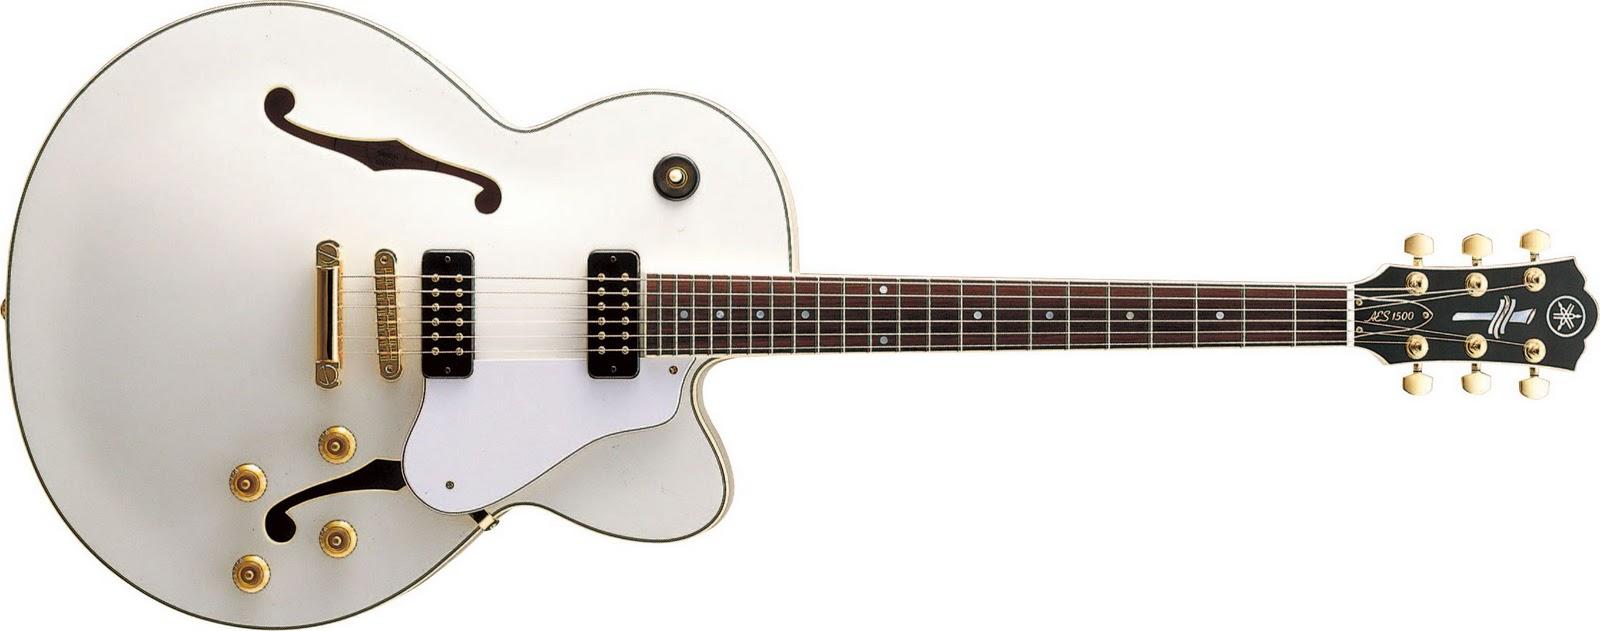 brand new guitars price yamaha. Black Bedroom Furniture Sets. Home Design Ideas